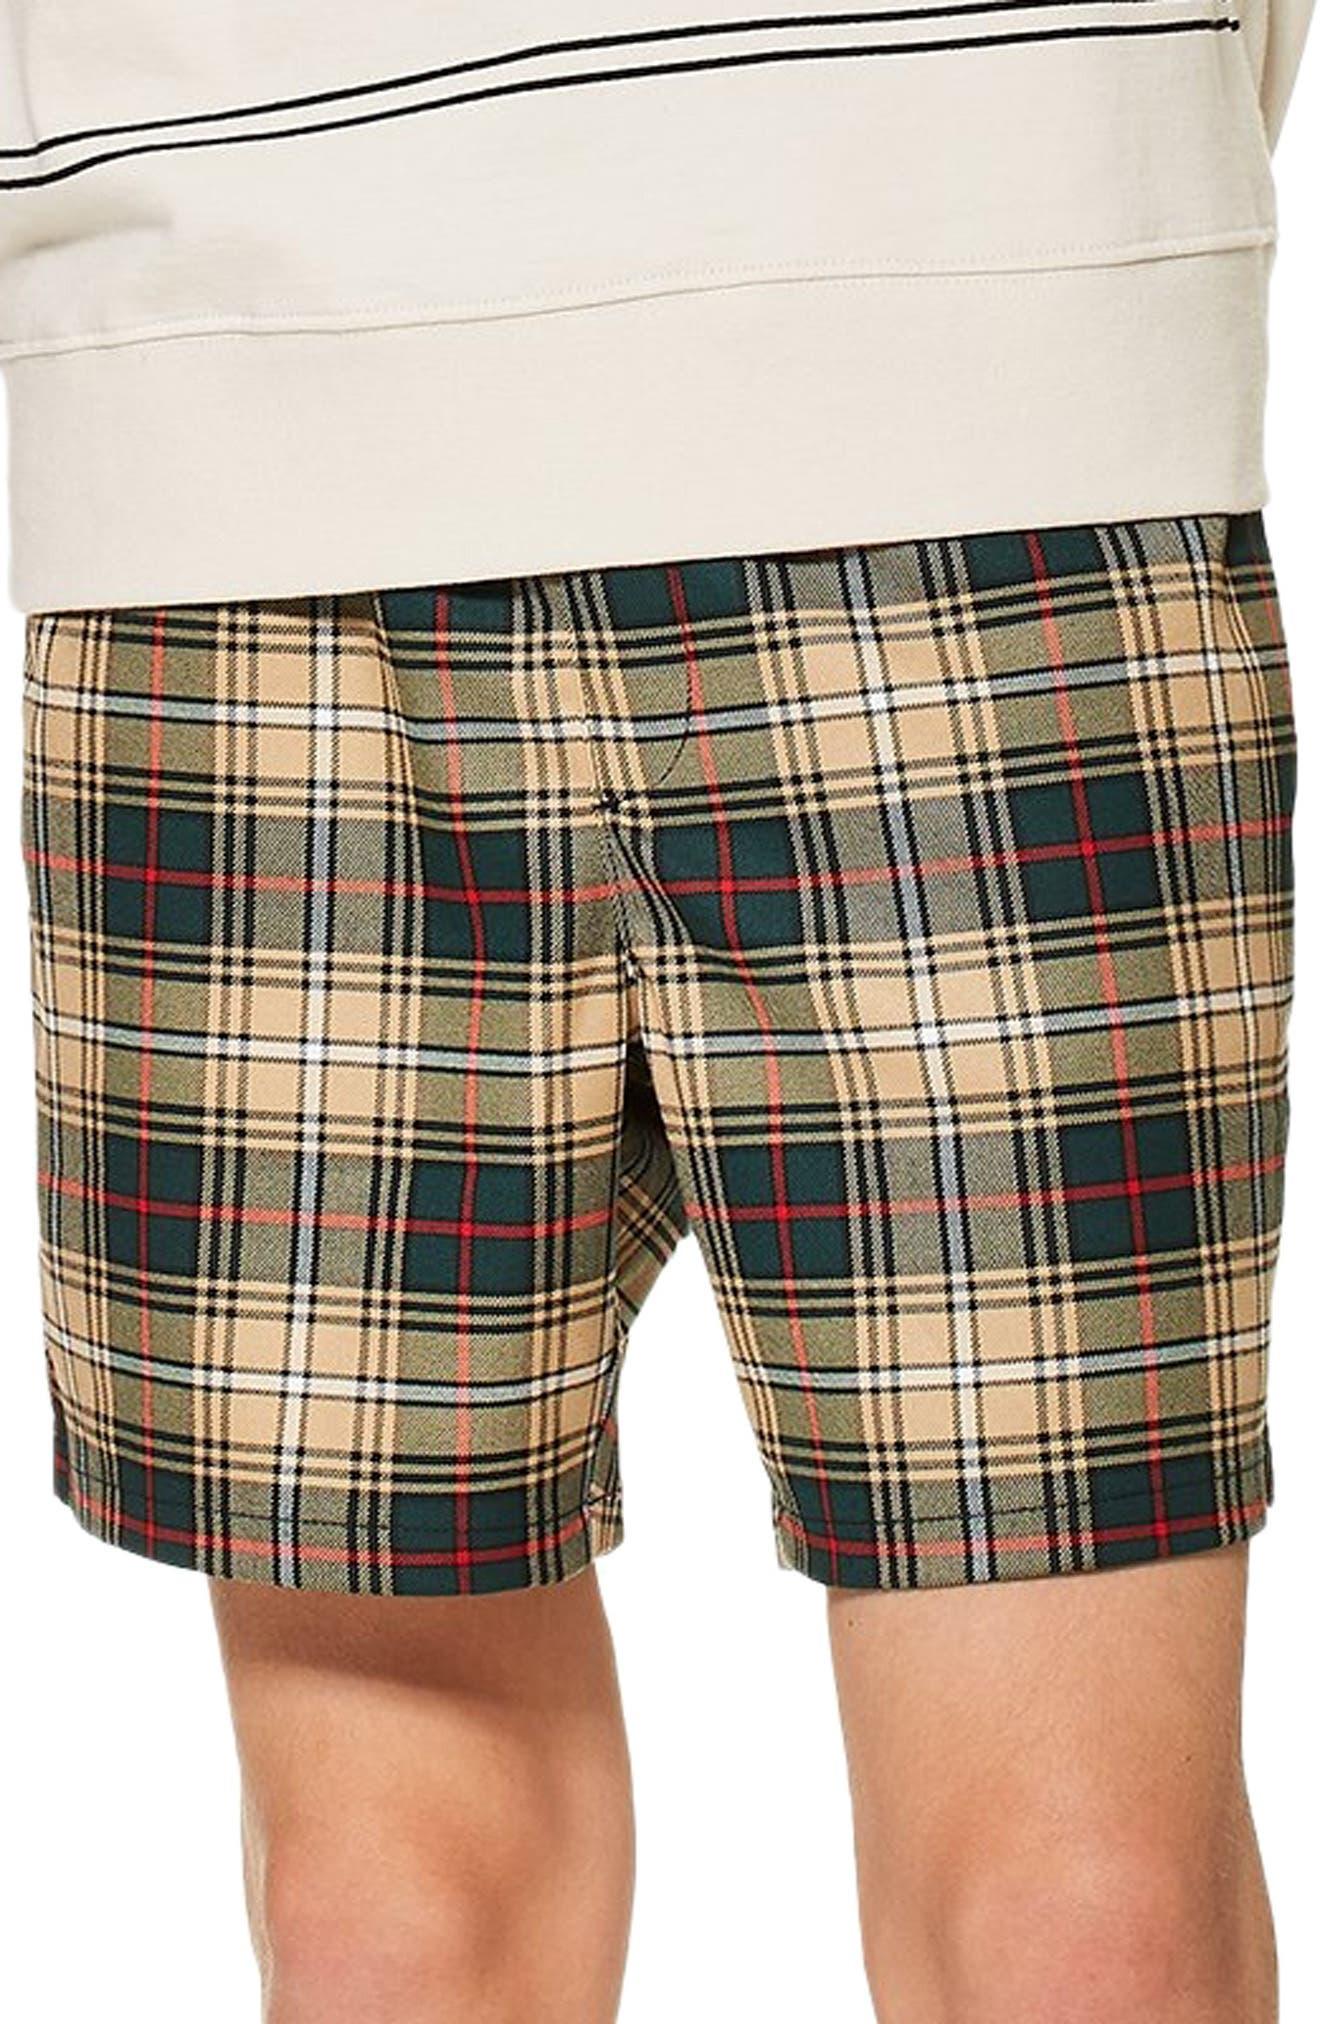 Check Shorts,                             Main thumbnail 1, color,                             BEIGE MULTI